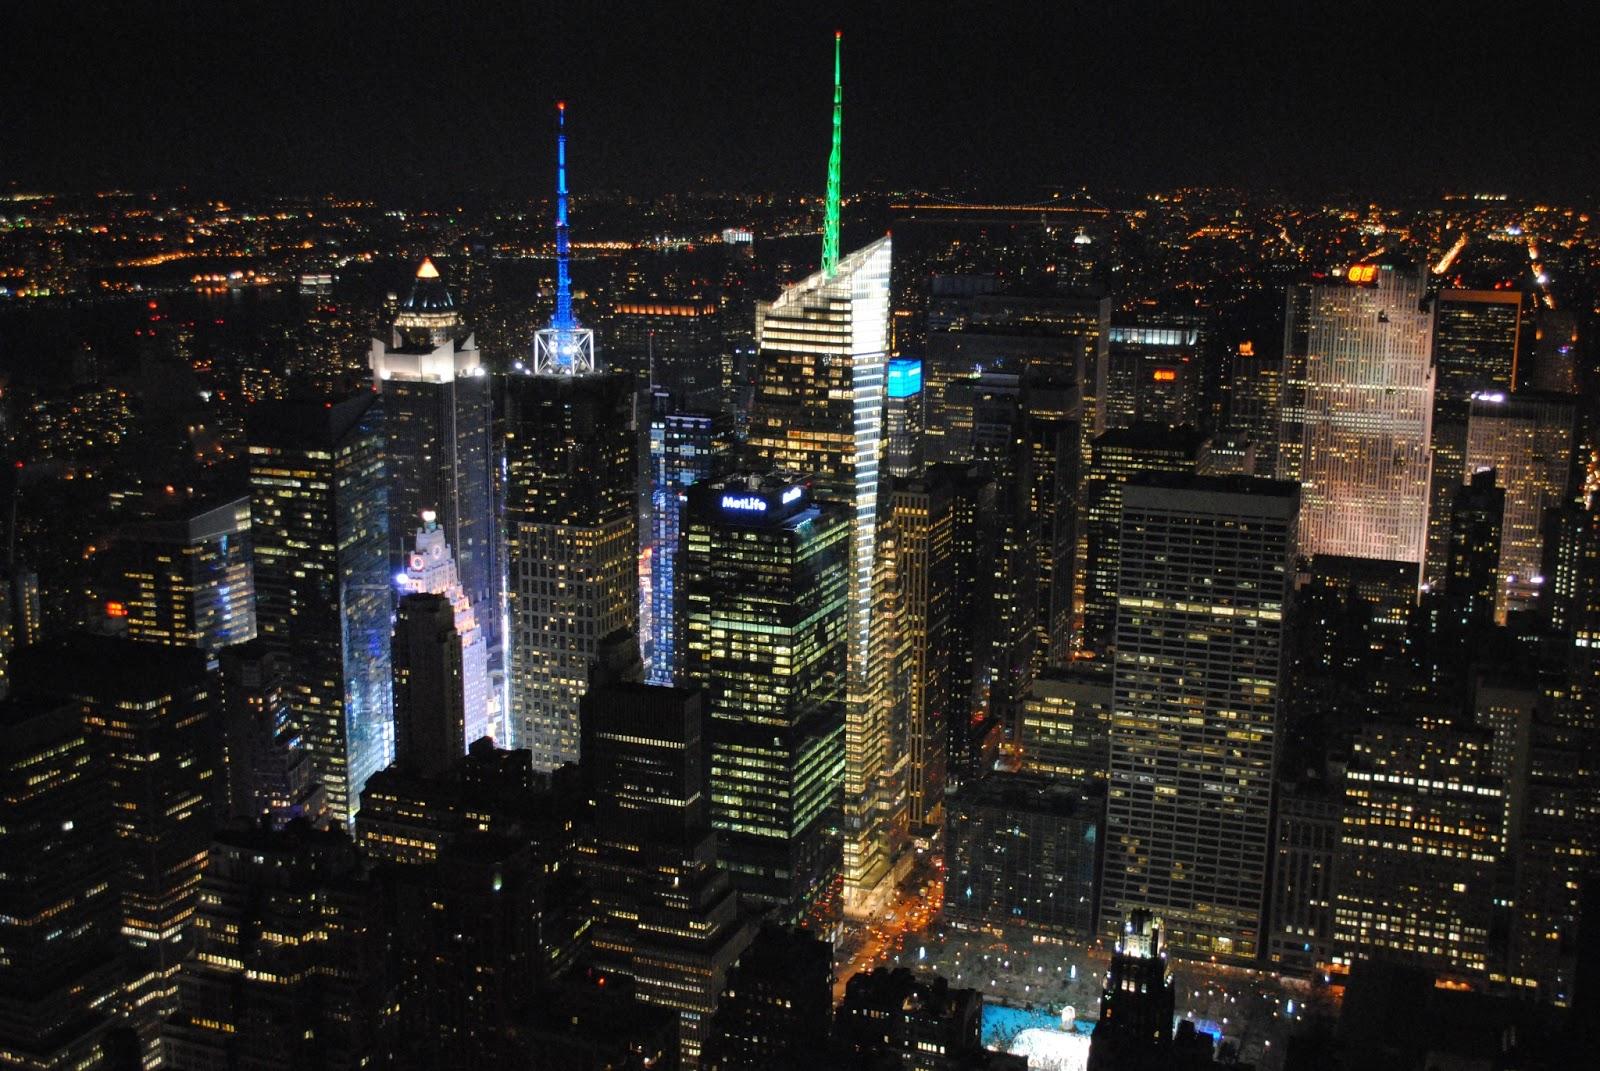 Free Download New York City Hd Desktop Wallpaper 1080p Download Fine Hd 1600x1071 For Your Desktop Mobile Tablet Explore 47 Hd New York City Wallpaper New York City Wallpaper